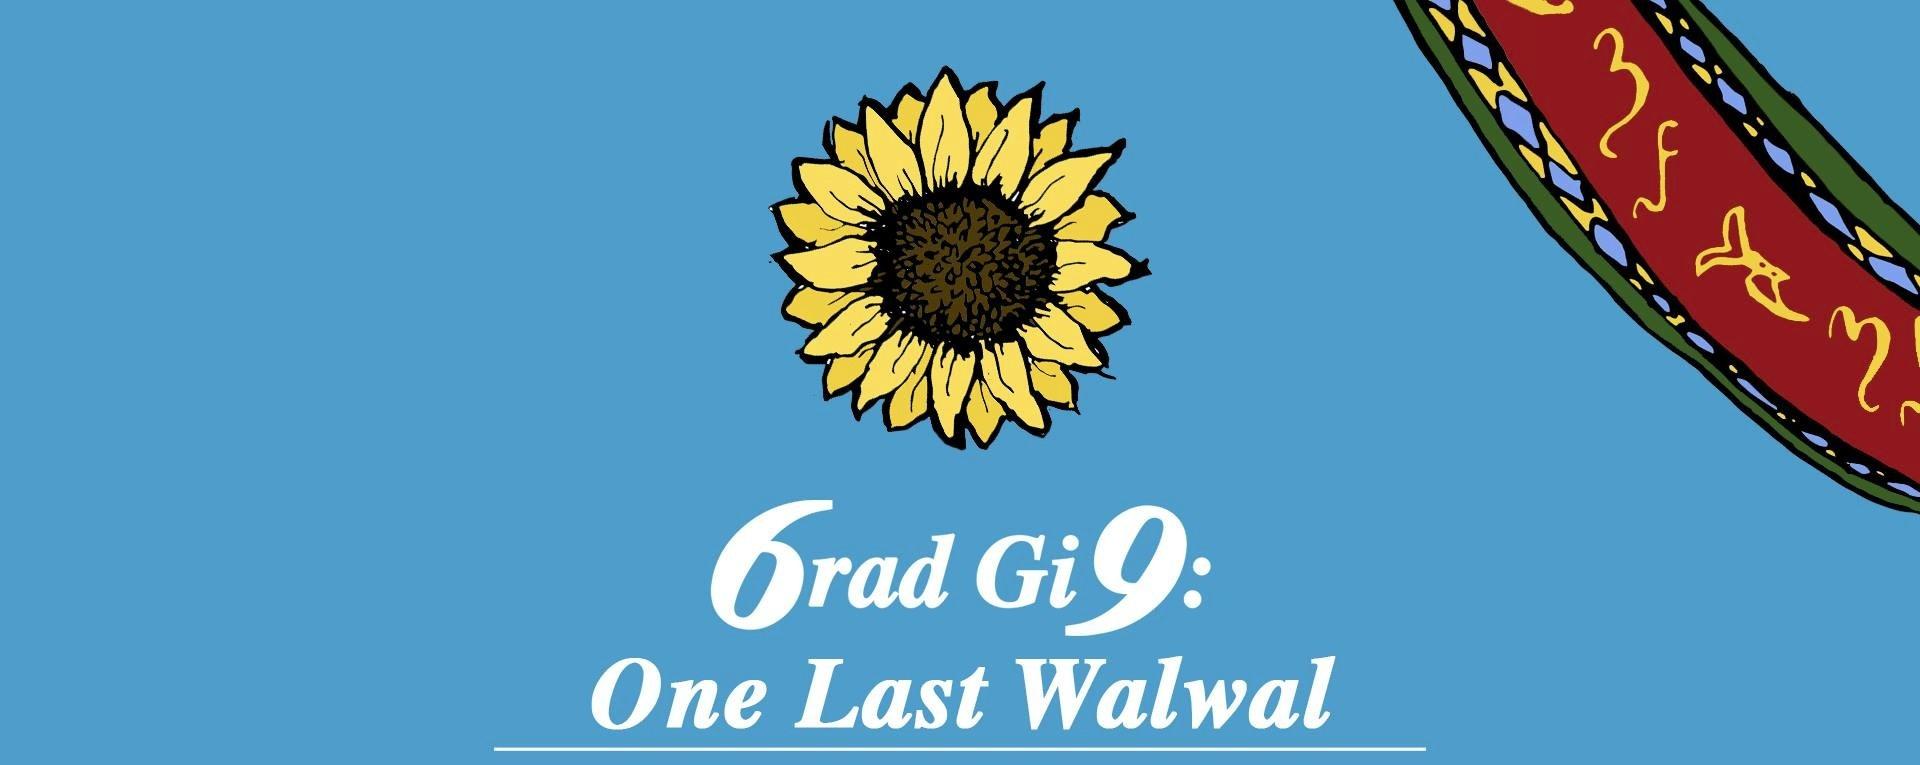 6rad gi9: One Last Walwal